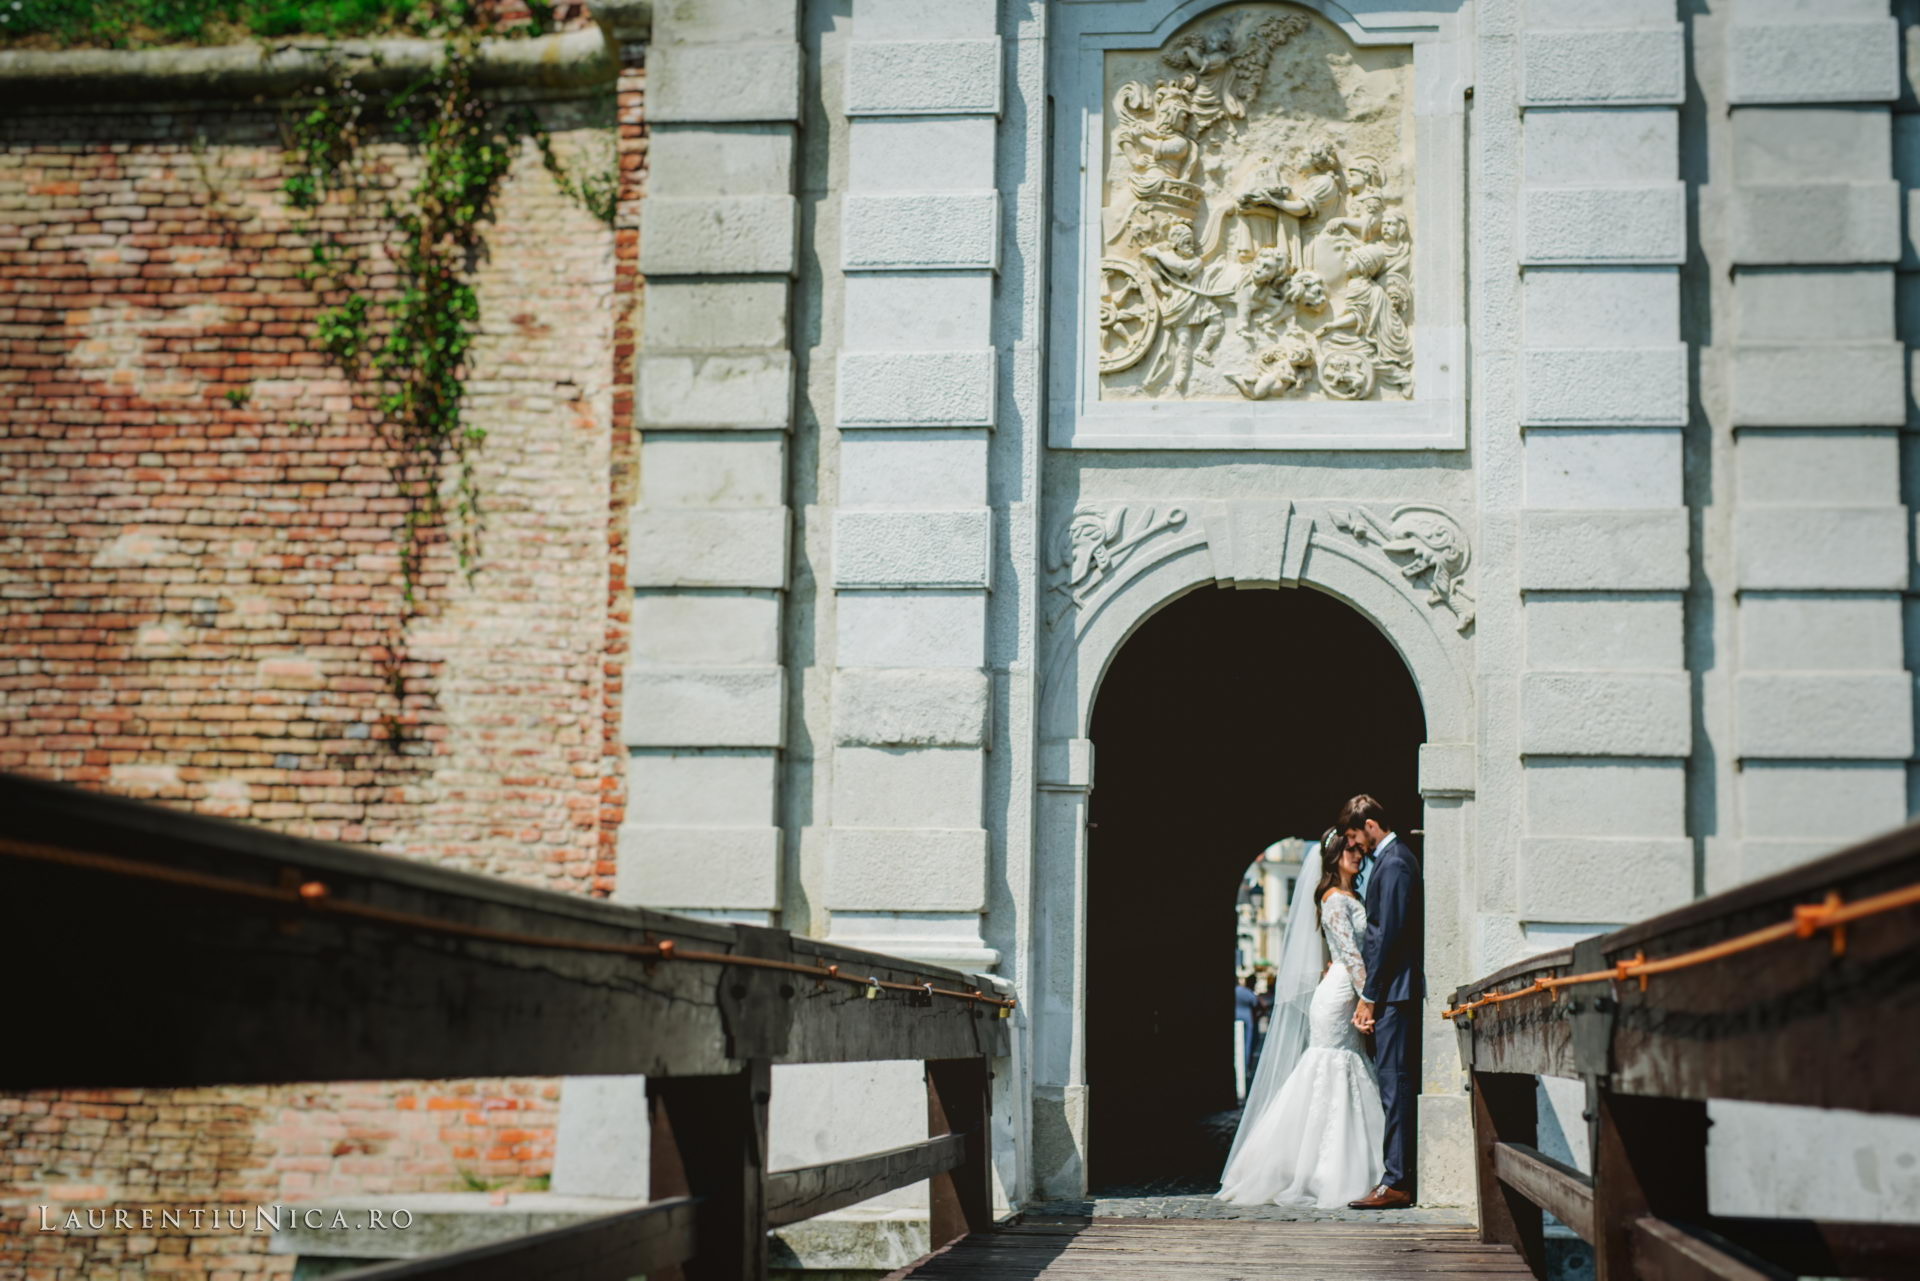 cristina_si_ovidiu-after-wedding-alba-iulia_fotograf_laurentiu_nica_04